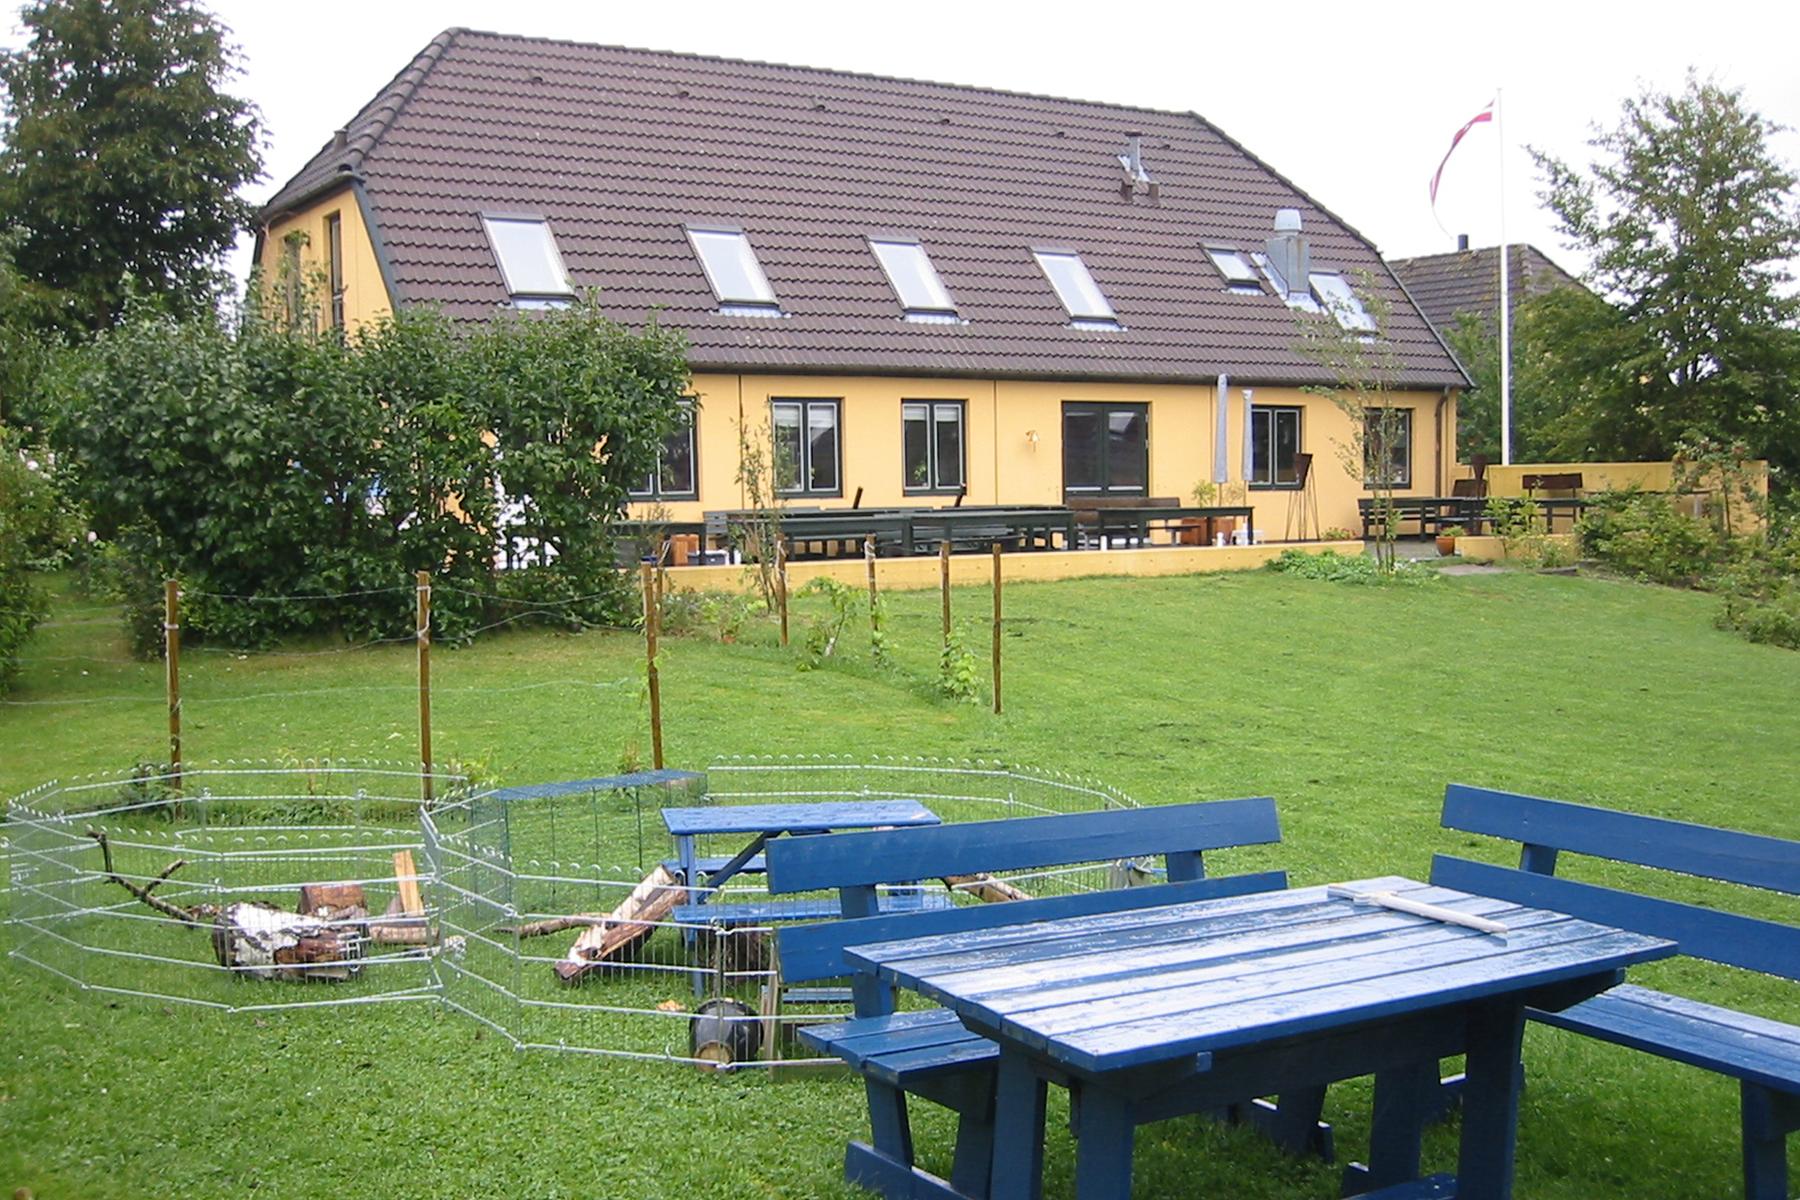 Stavnsbaandet Cohousing  in Farum, DK. Designed by Ortving of Friis Jorgensen